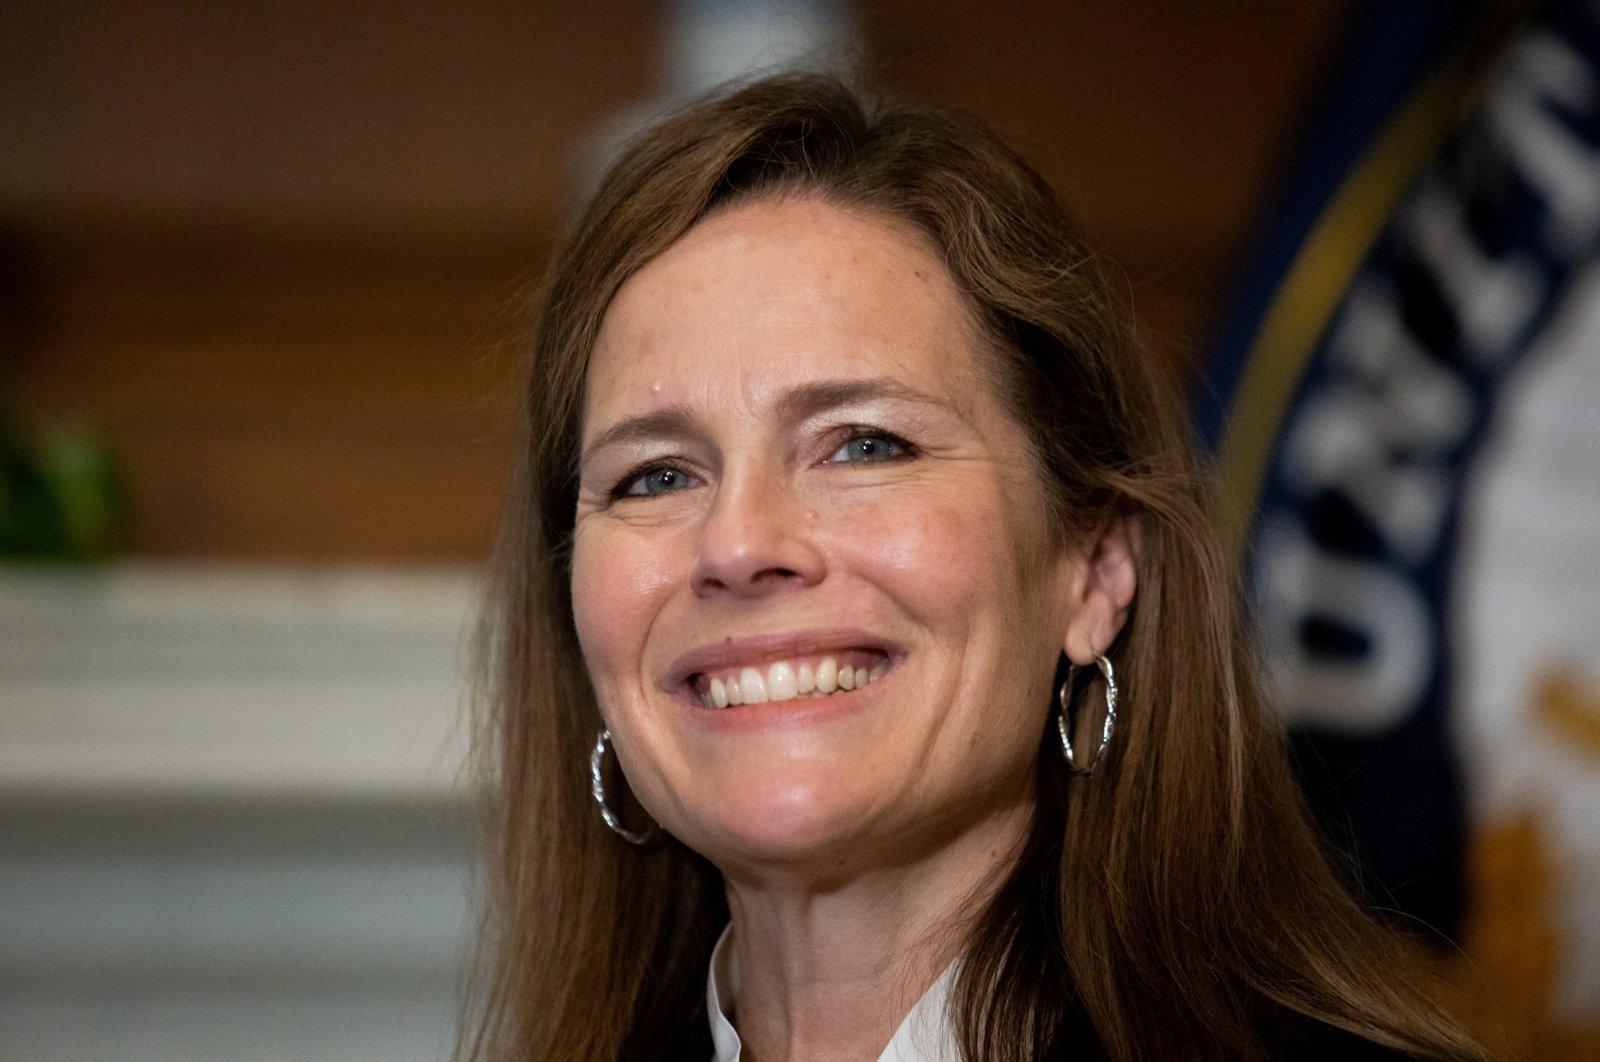 U.S. Supreme Court nominee Amy Coney Barrett at the U.S. Capitol in Washington, U.S. on Oct. 1, 2020. (Reuters Photo)